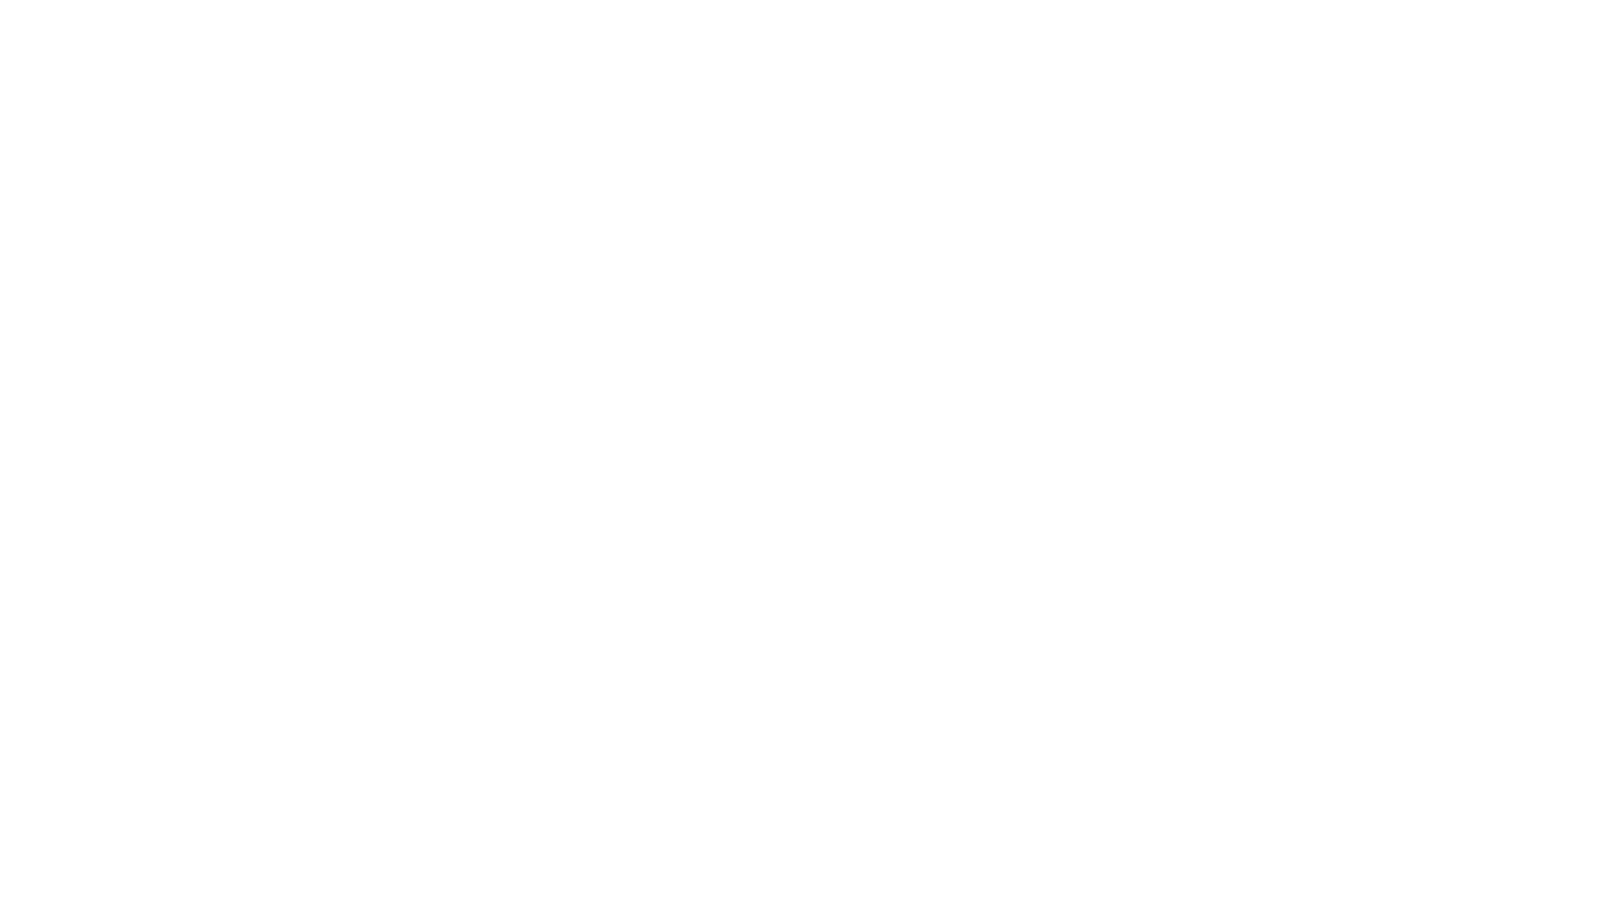 #SignageAkrilik #AcrylicSign #PapanTanda Signage Akrilik sangat cocok digunakan sebagai rambu / petunjuk seperti Alat Pemadam Api, Smoking Area, Plat Geser dan lain sebagainya. Custom desain sesukamu dan custom ukuran sesuai kebutuhanmu hanya disini! Nikmati pelayanan terbaik dan responsif dengan harga terjangkau! Music : Alex-Tropical Summer House (free-stock-music.com) #JhanaAcrylic #SignageJagalahKebersihan #PlatGeser #TandaPemadamApi #SmokingArea #PapanTandaAkrilik